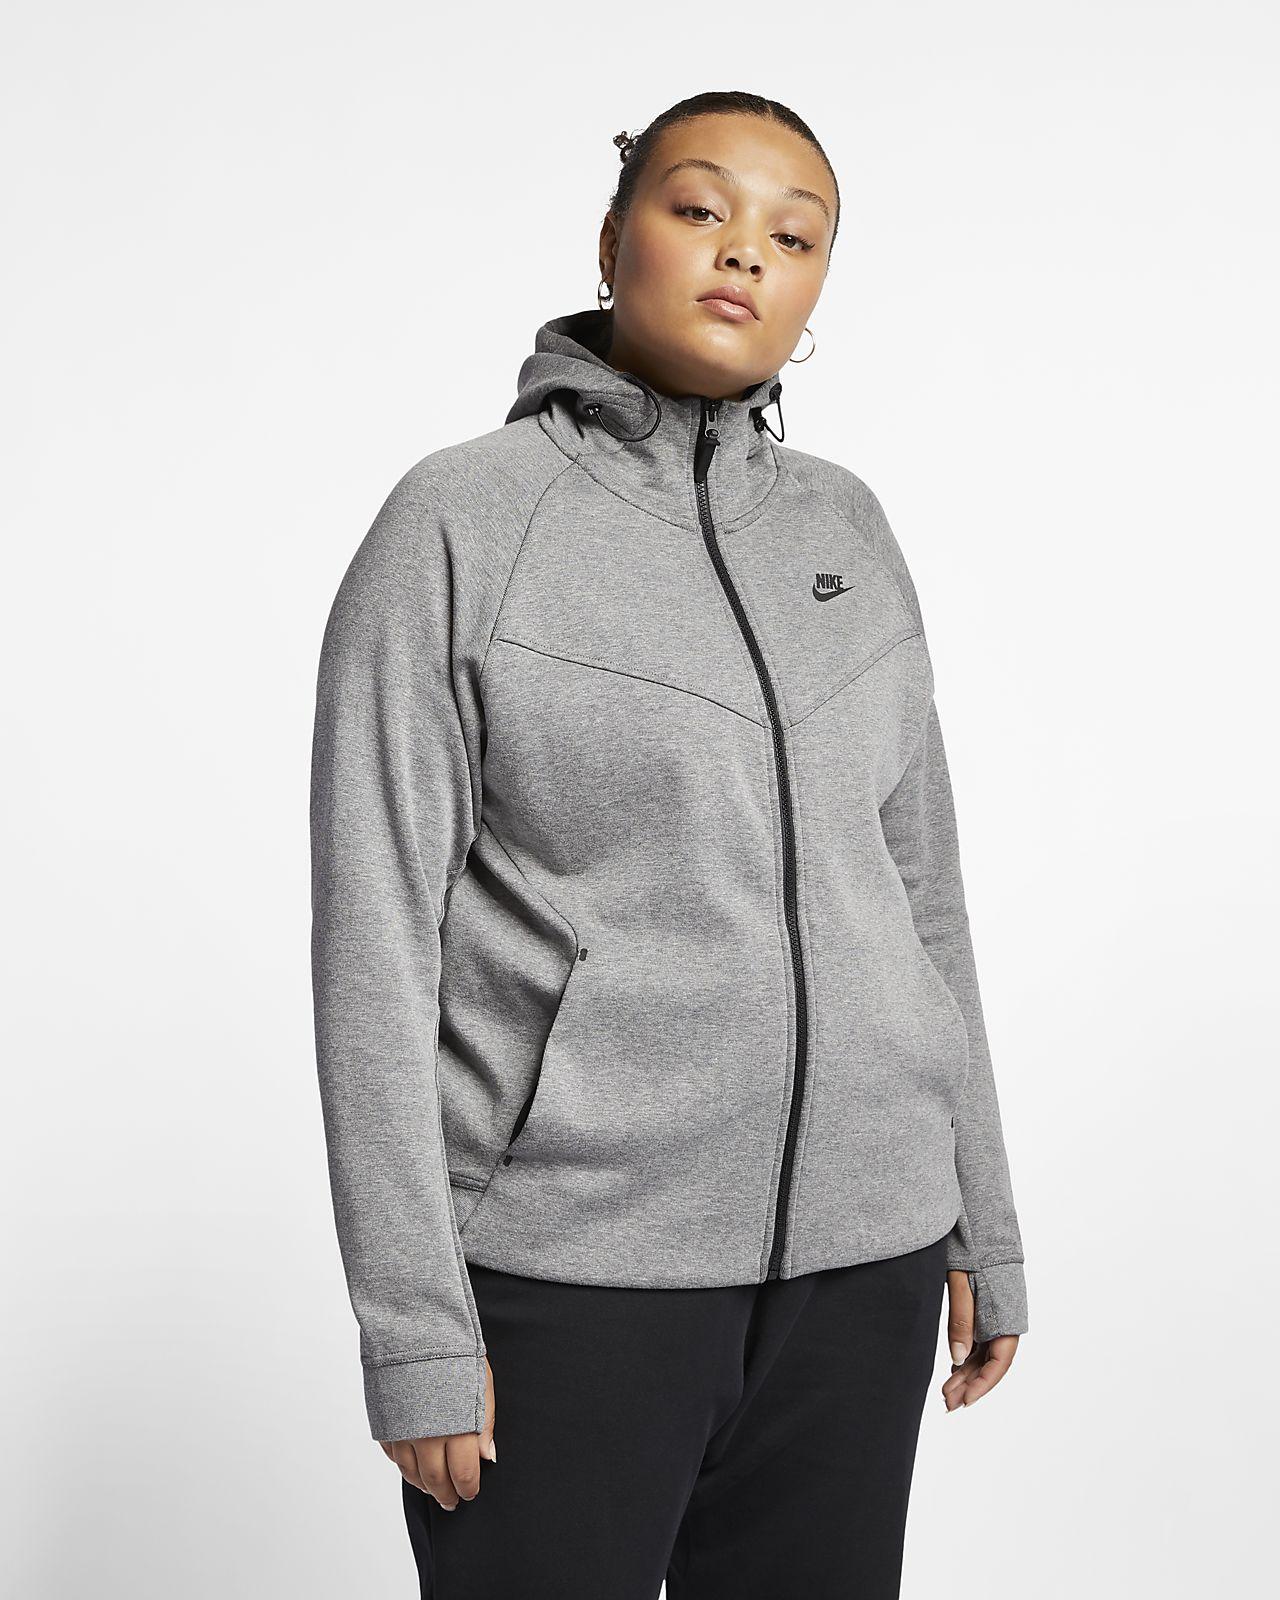 Nike Sportswear Tech Fleece Damen Hoodie mit durchgehendem Reißverschluss (Große Größen)